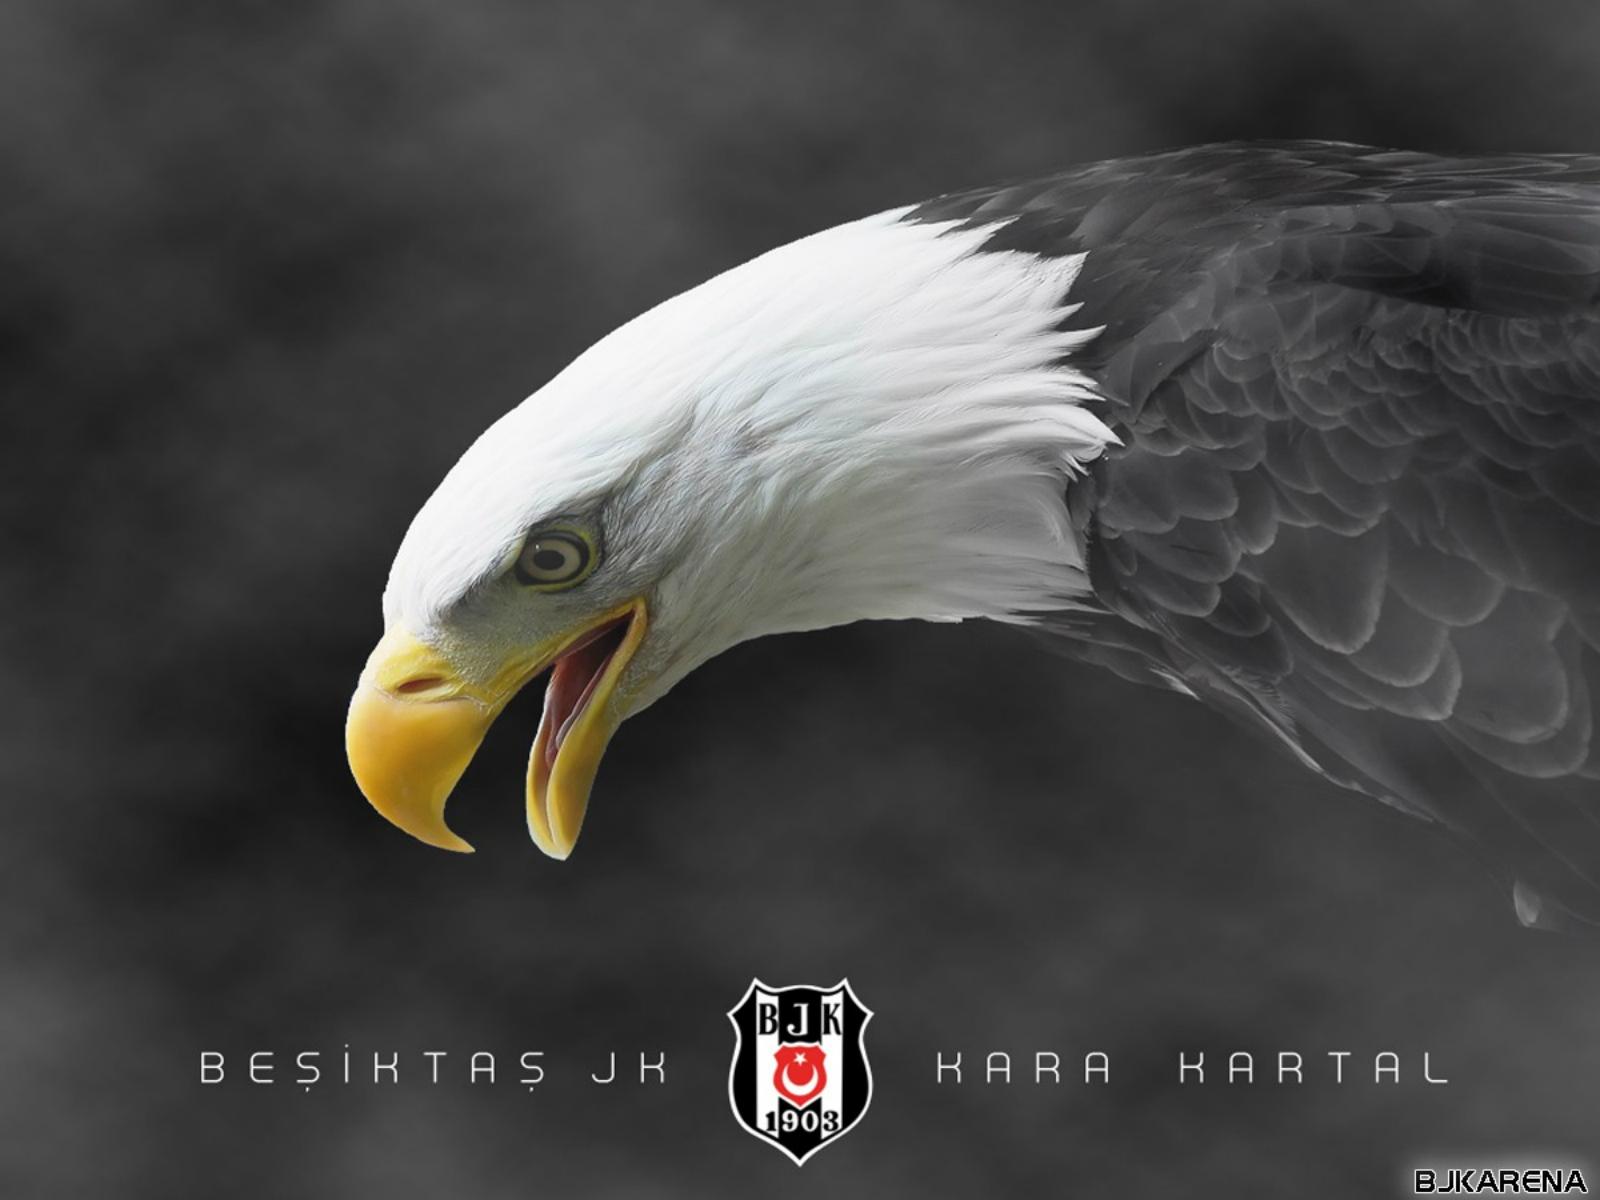 www.Vvallpaper.net bjk besiktas kara kartal logo amblem indir siyah beyaz 1600x1200 arena bjk arena Beşiktaş HD Logoları